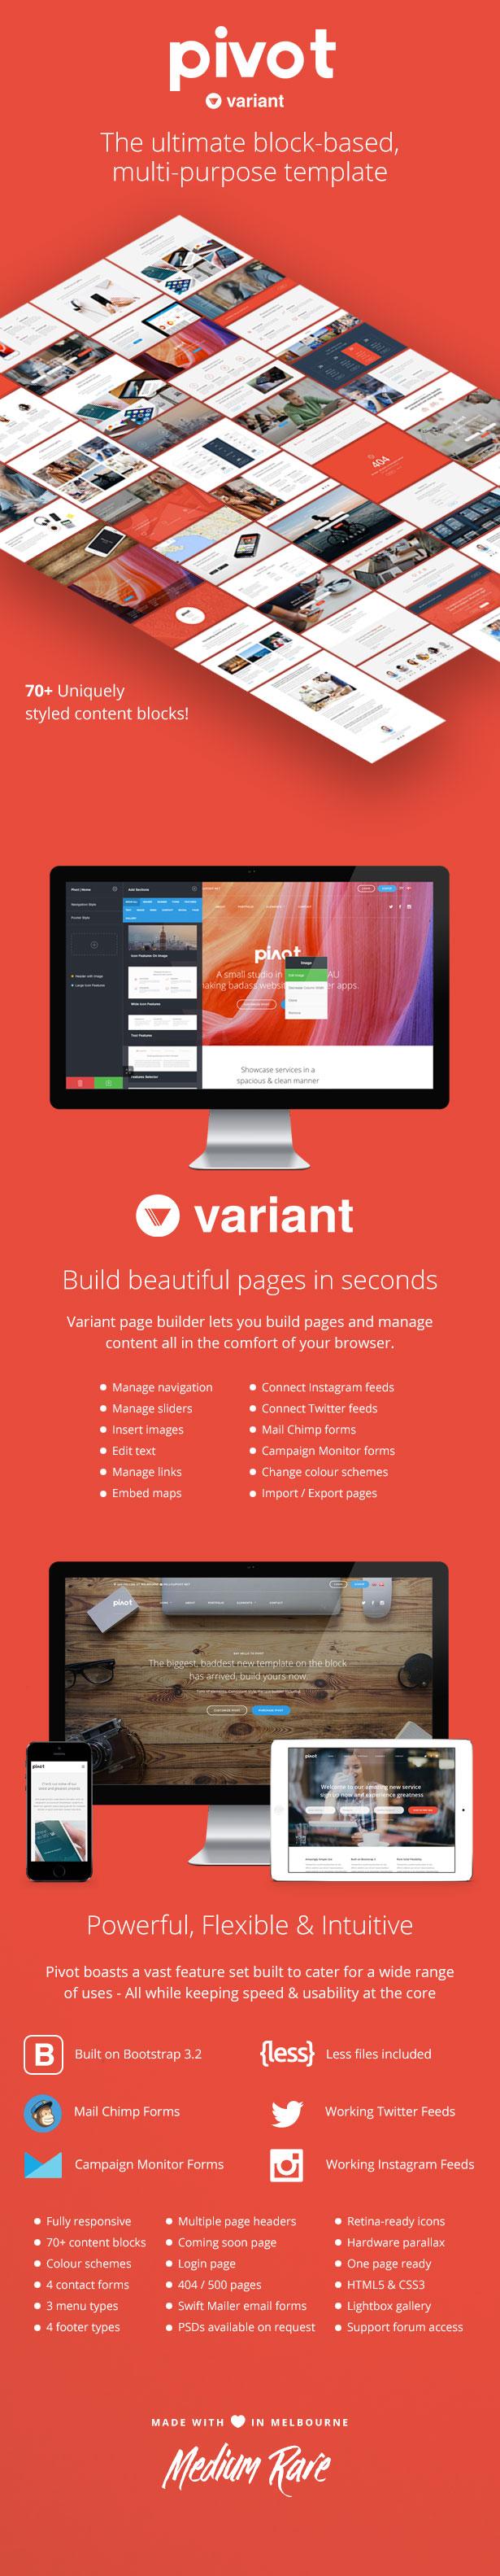 pivot promo - Pivot | Multi-Purpose HTML with Page Builder